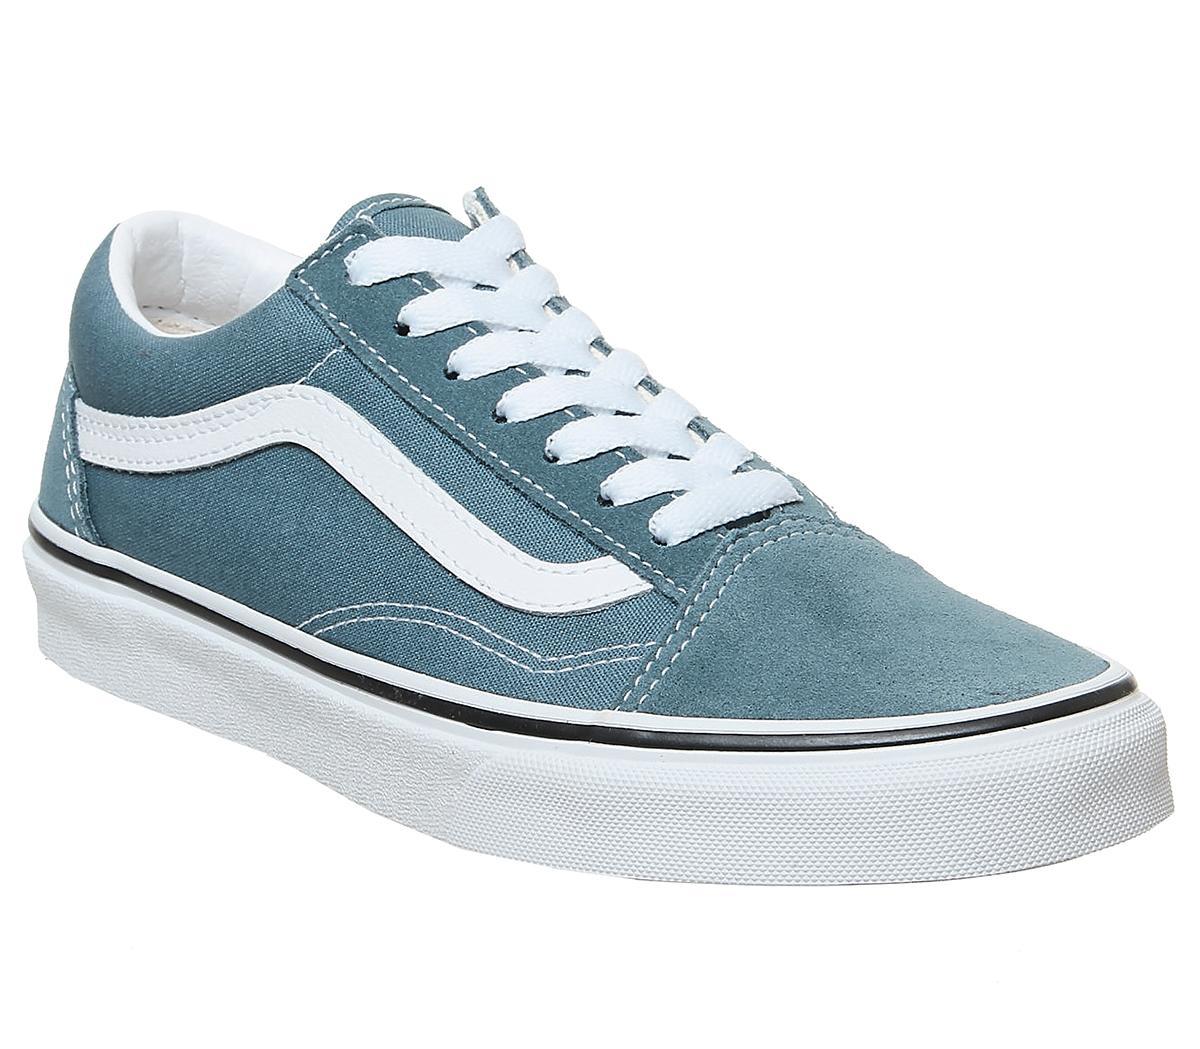 Men's Vans Old Skool Blue Mirage True White £35 @ Office Shoes